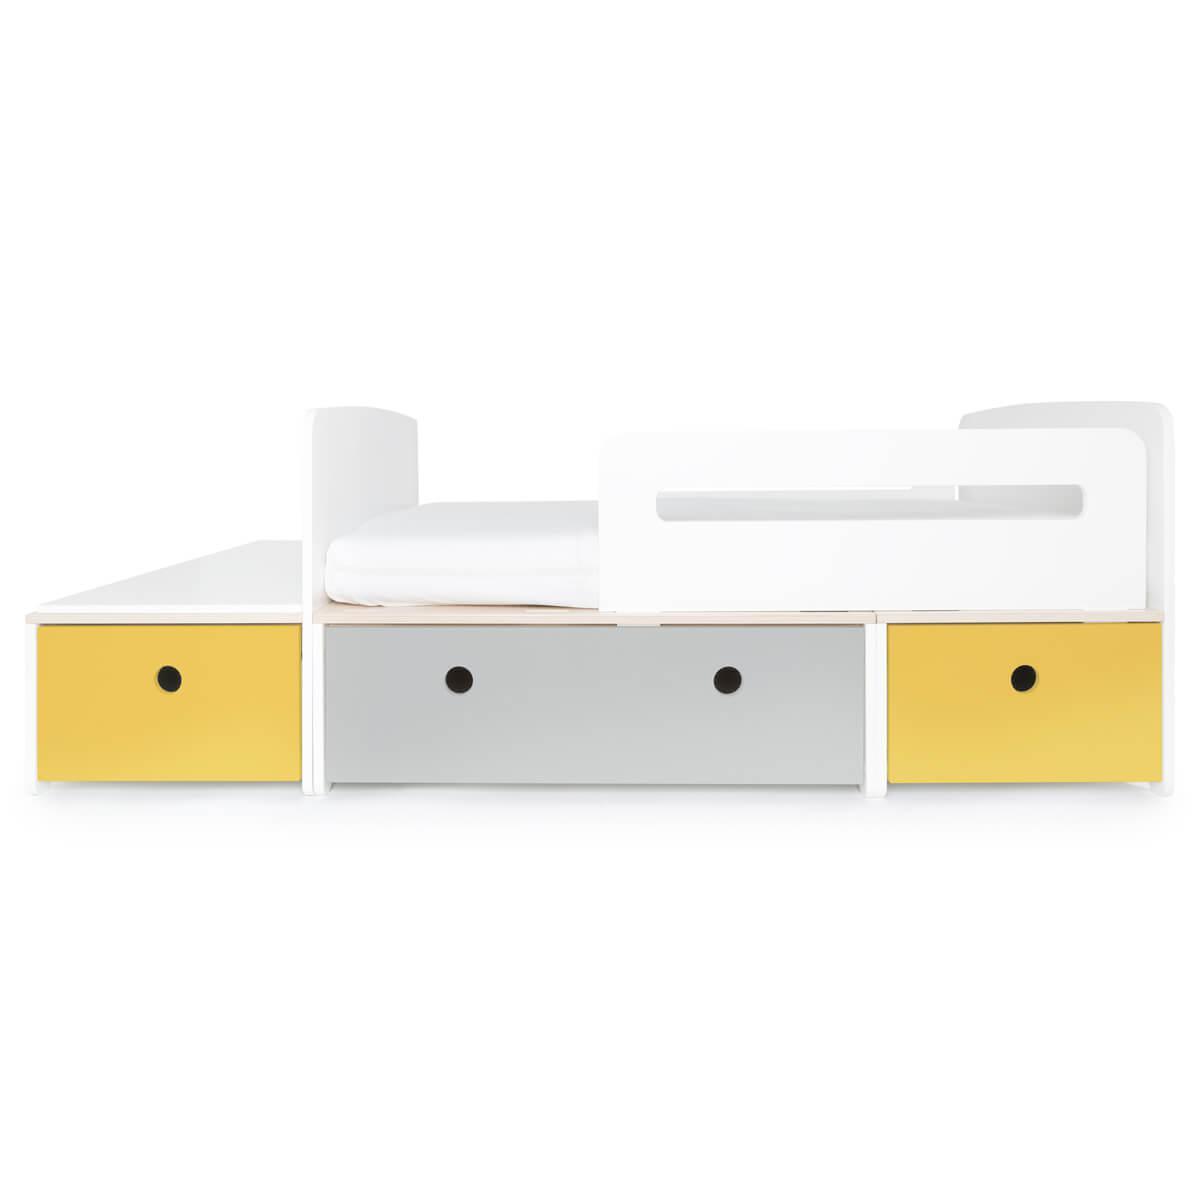 Juniorbett mitwachsend 90x150/200cm COLORFLEX Abitare Kids nectar yellow-pearl grey-nectar yellow